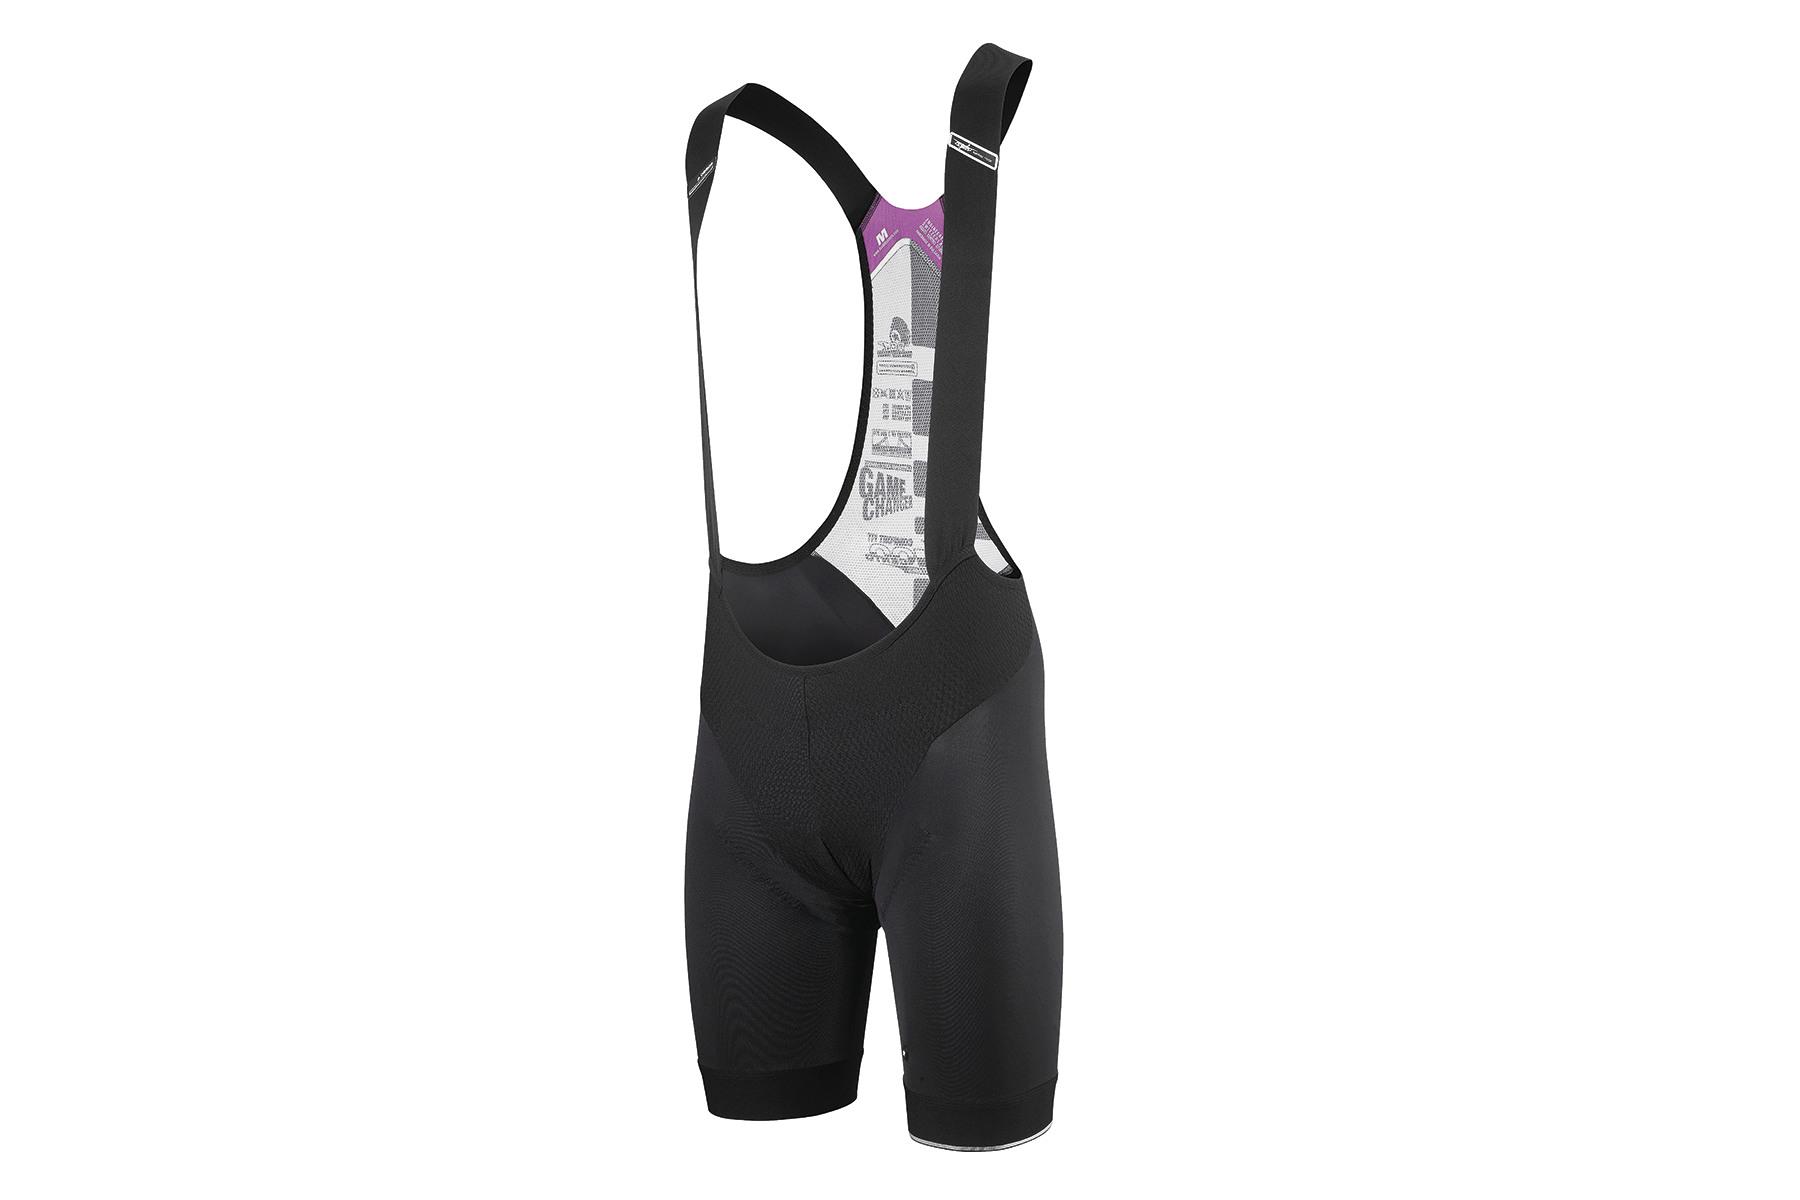 Buy ASSOS assos T.cento_S7 bib shorts